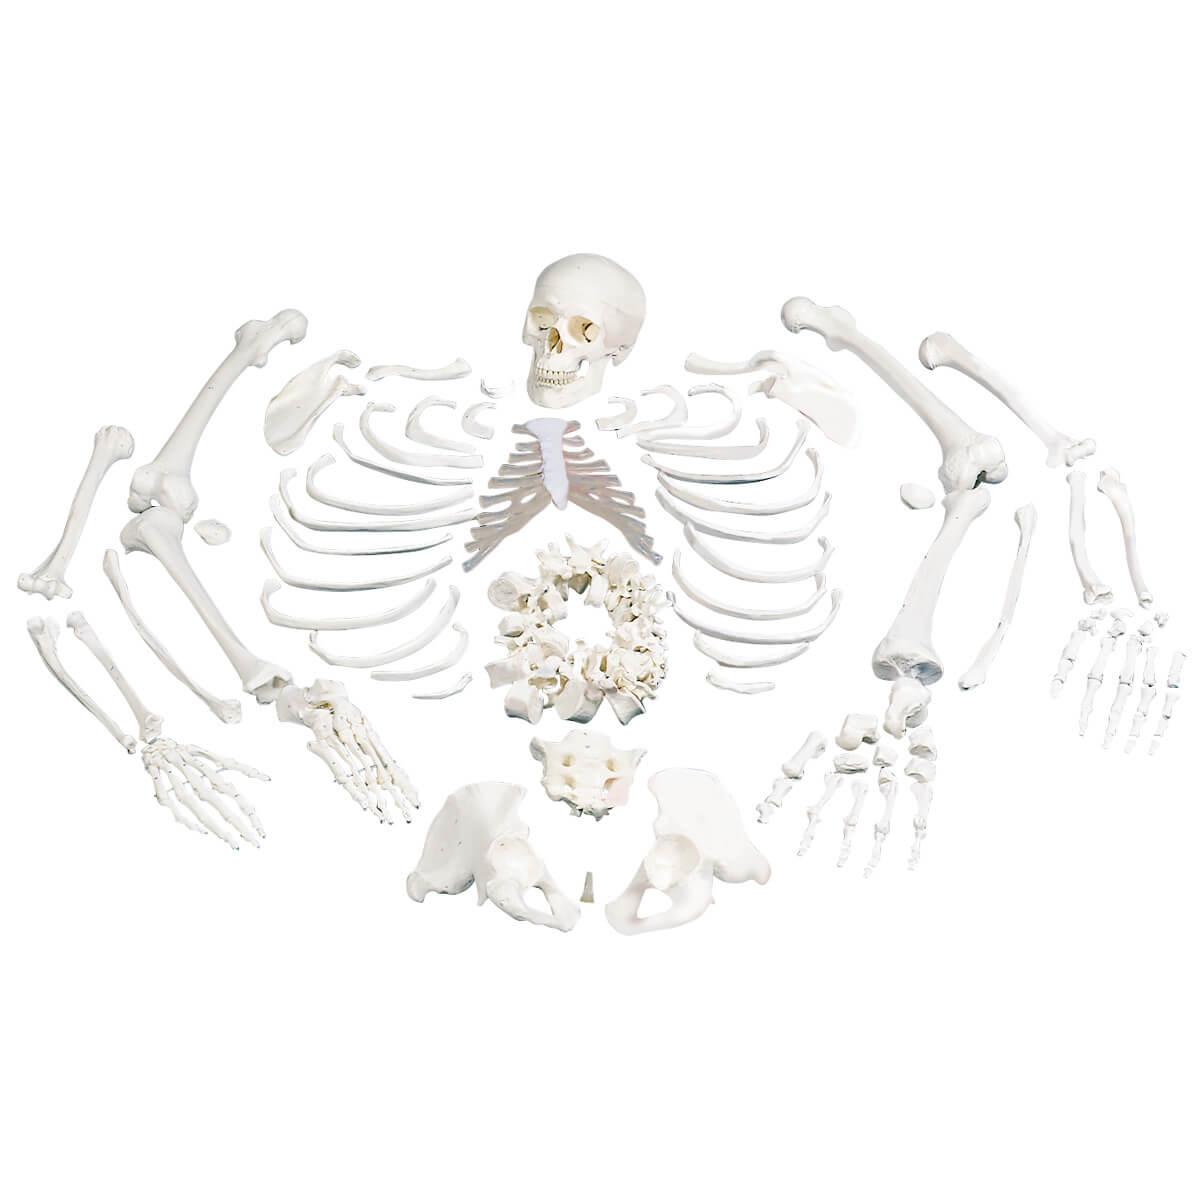 Esqueleto Completo Desarticulado